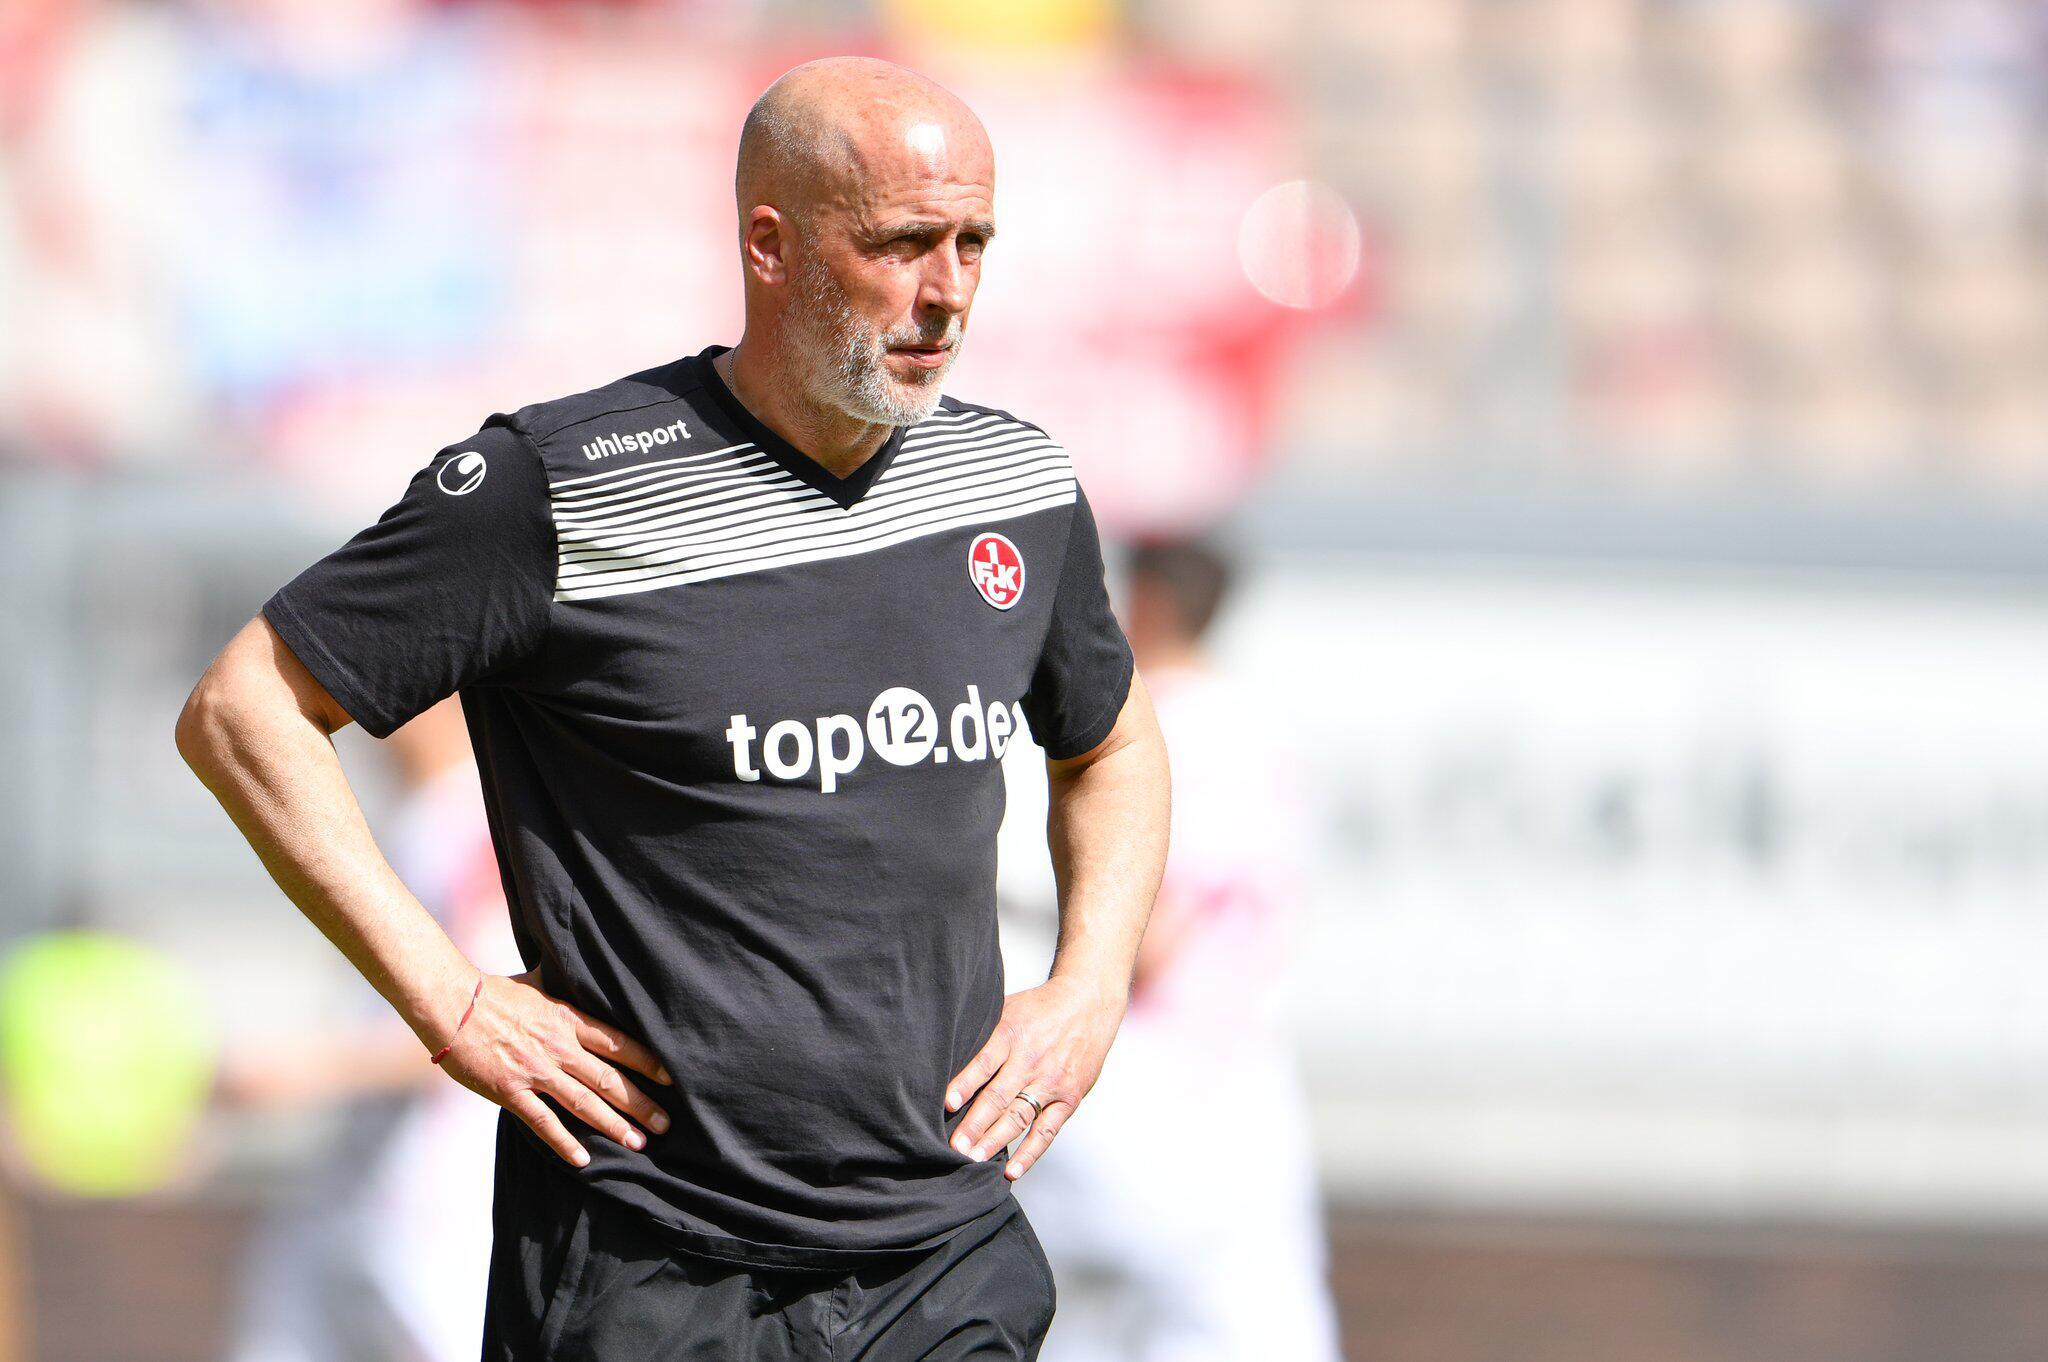 Bild zu 1. FC Kaiserslautern vs Jahn Regensburg